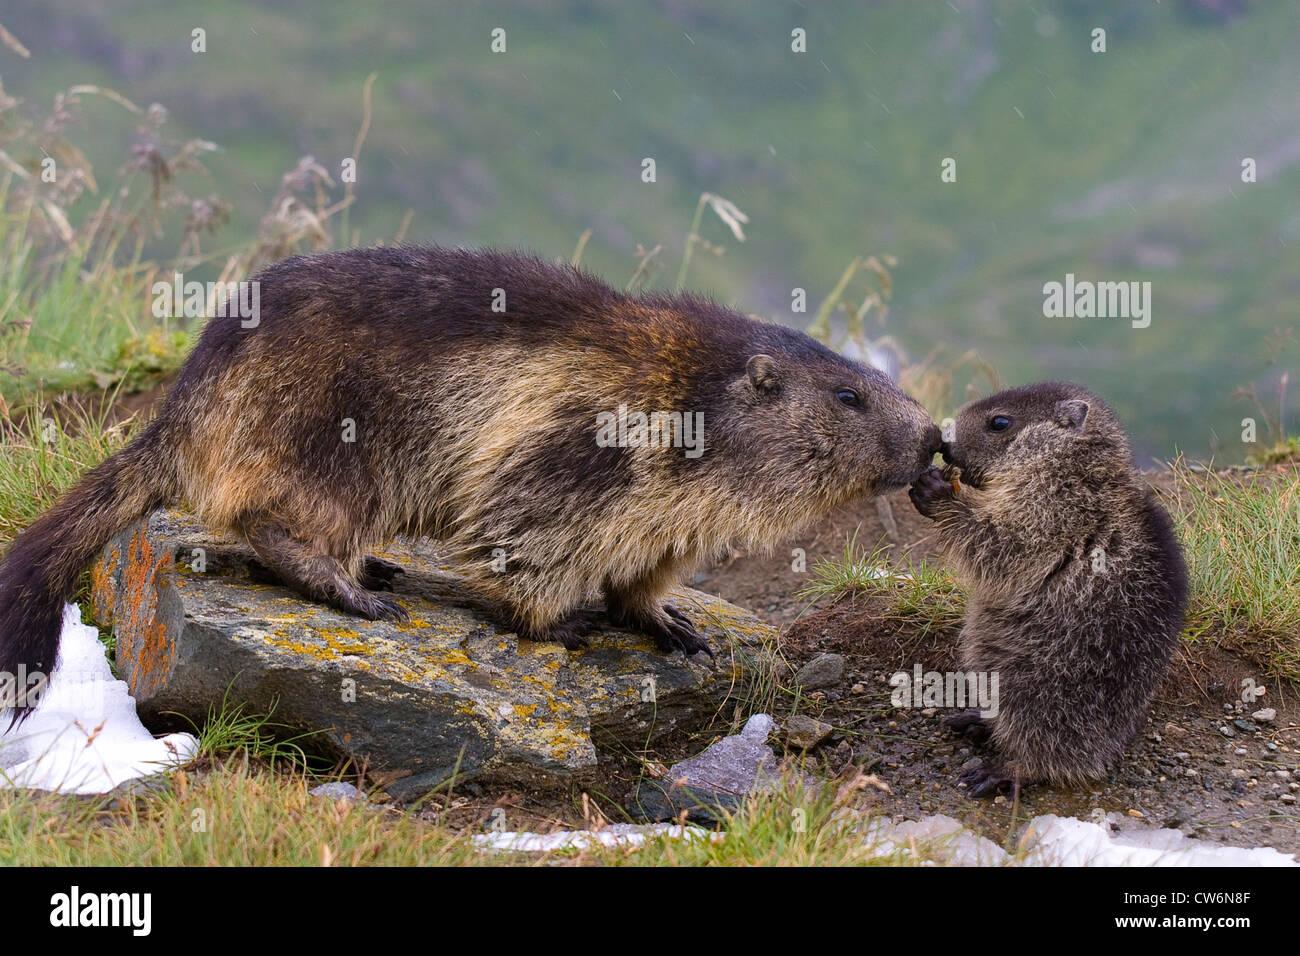 alpine marmot (Marmota marmota), adult with pup, Austria, NP Hohe Tauern, Grossglockner - Stock Image